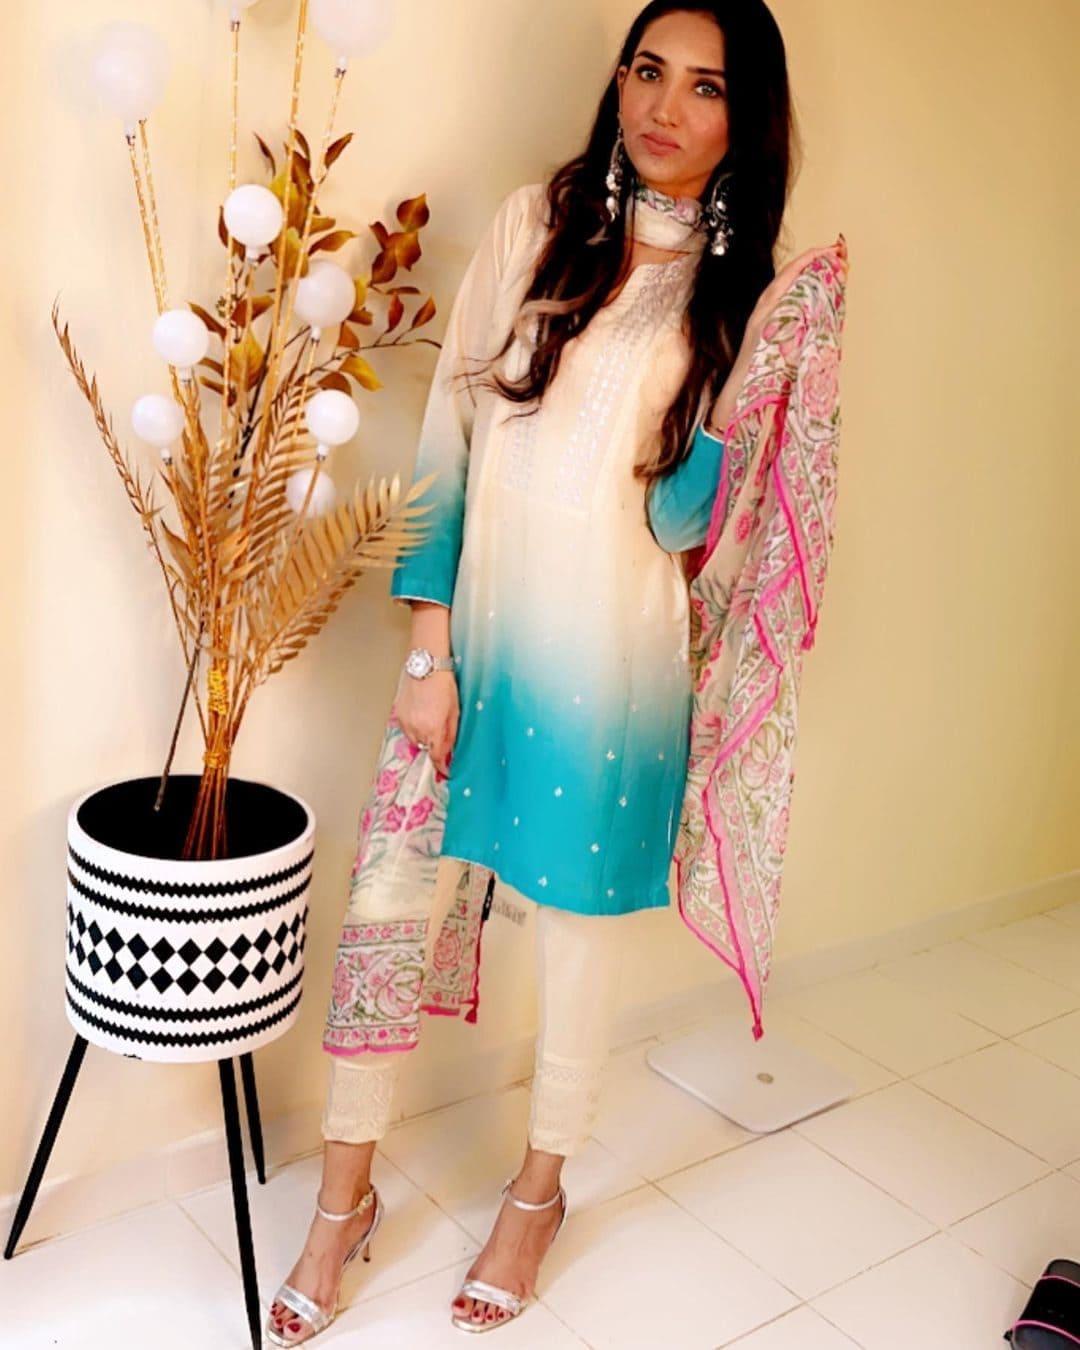 Sana Baloch (Model) Wiki, Age, Family, Net Worth & More 5